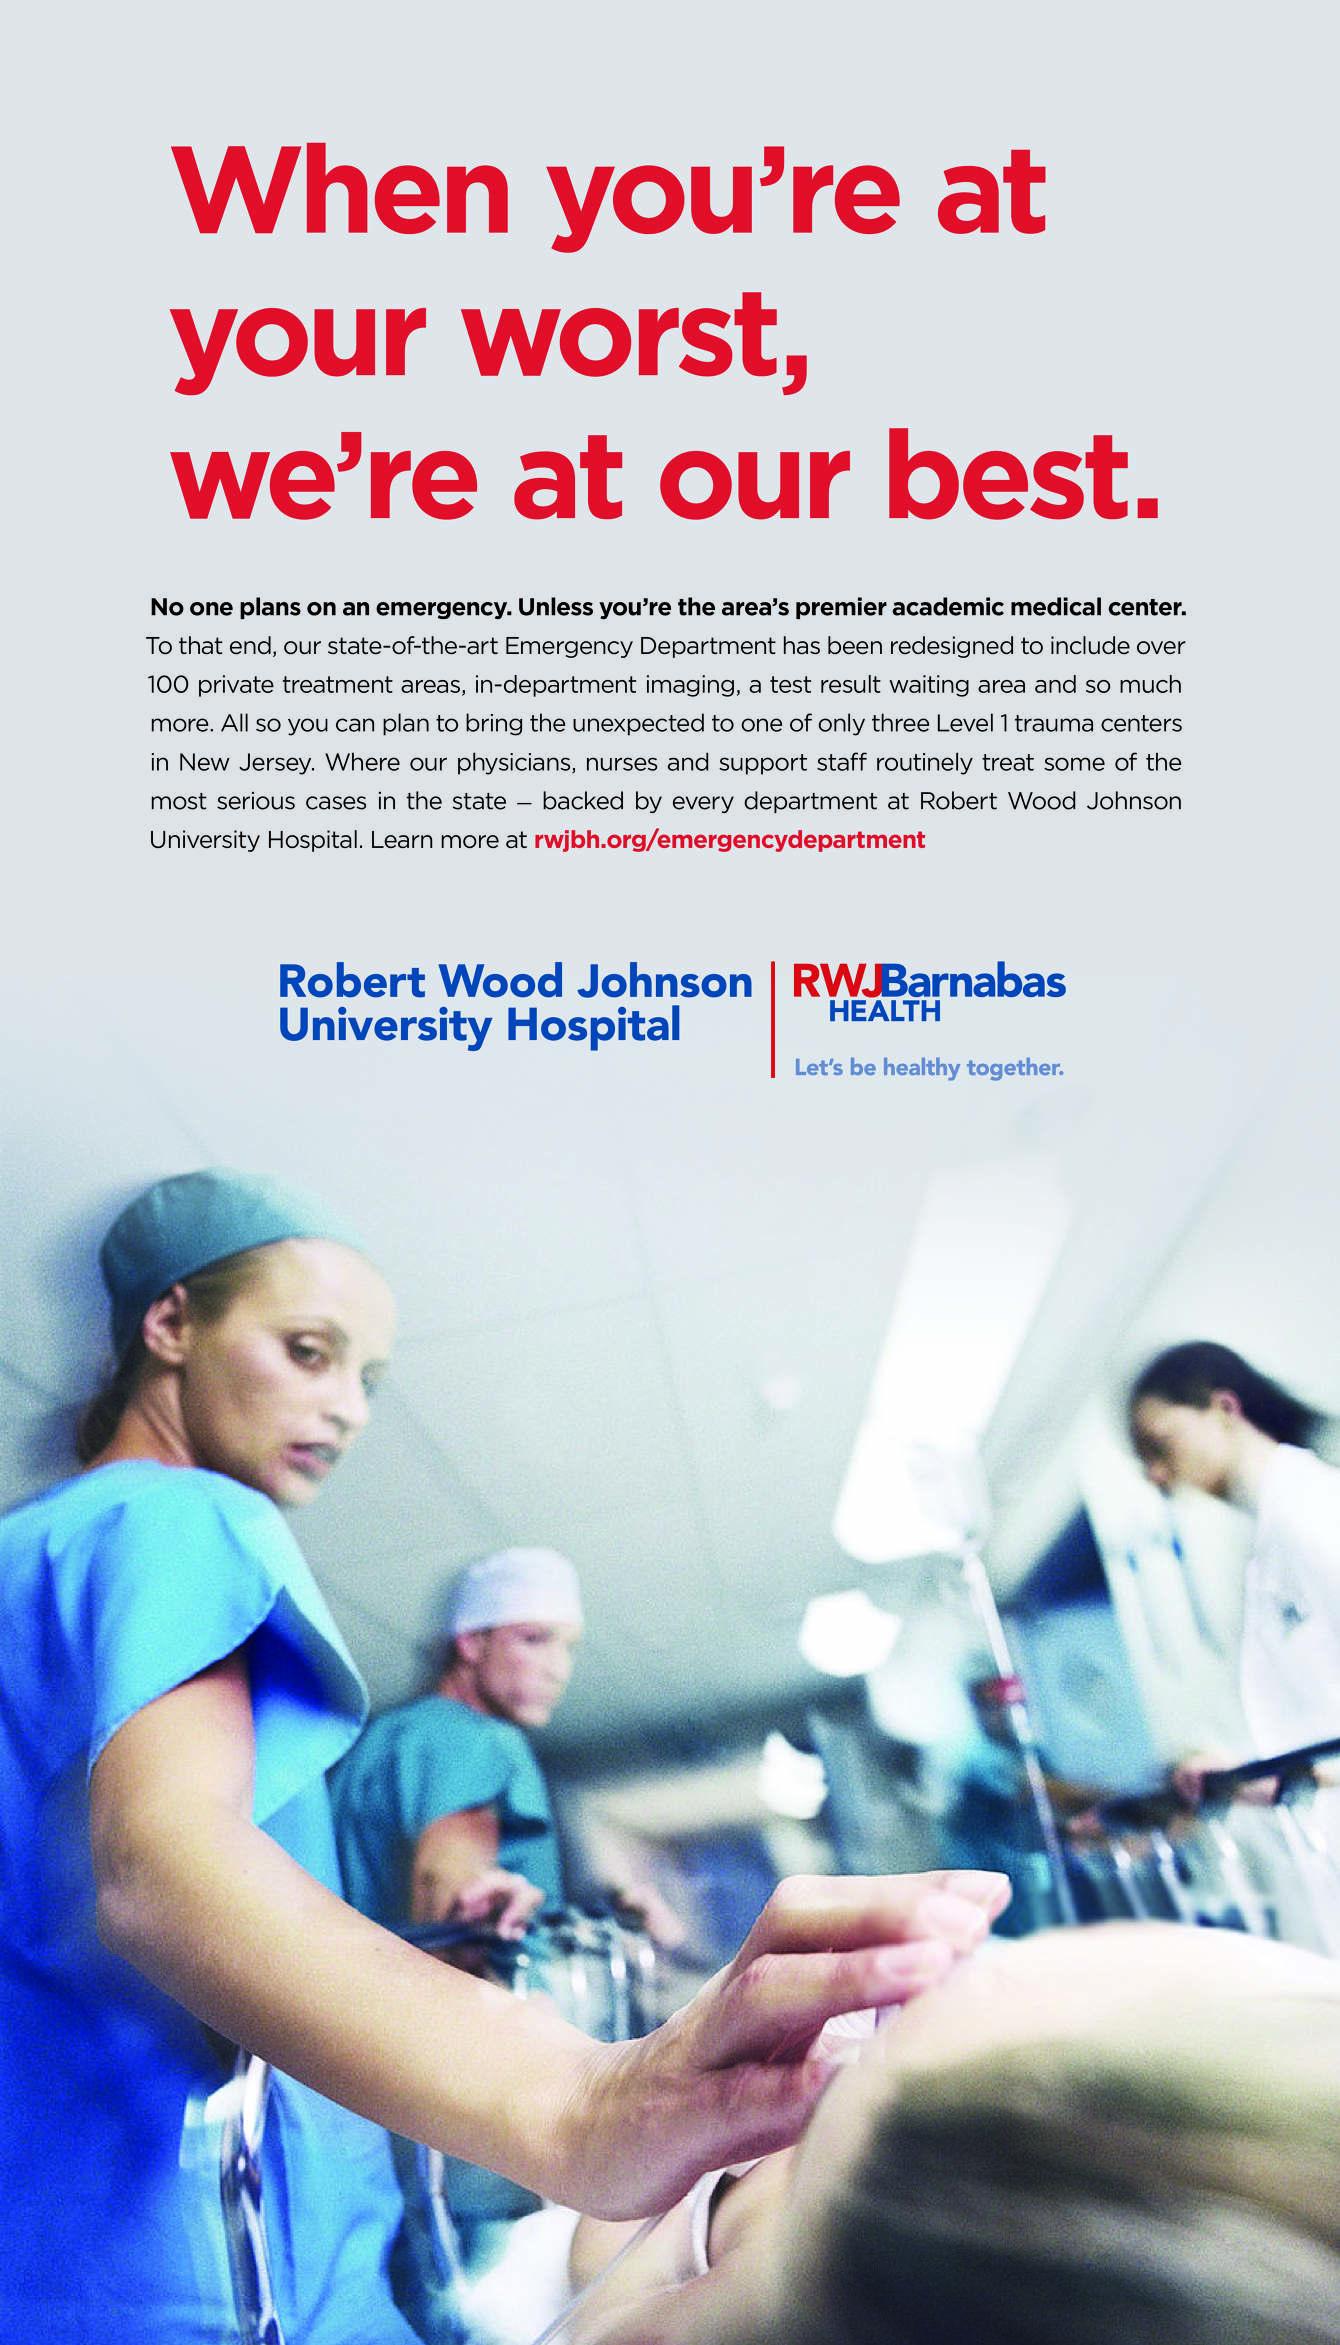 RWJ-Emergency-Dept.-WorstBest_1340_c.jpg